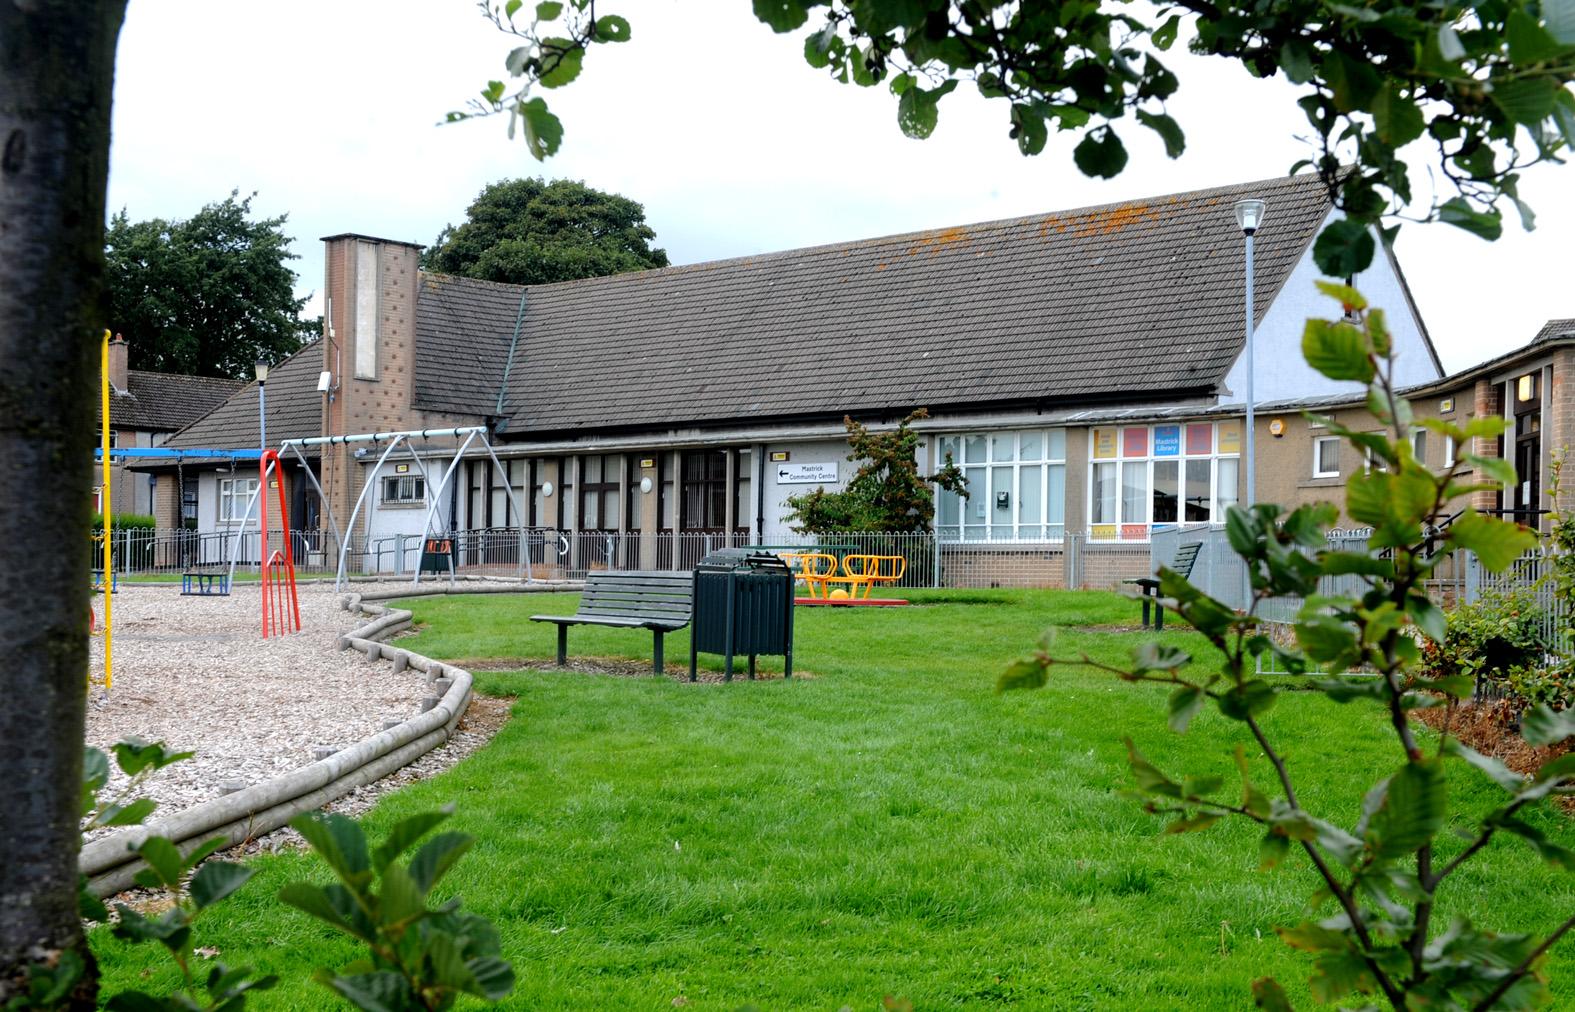 Mastrick Community Centre on Greenfern Road.